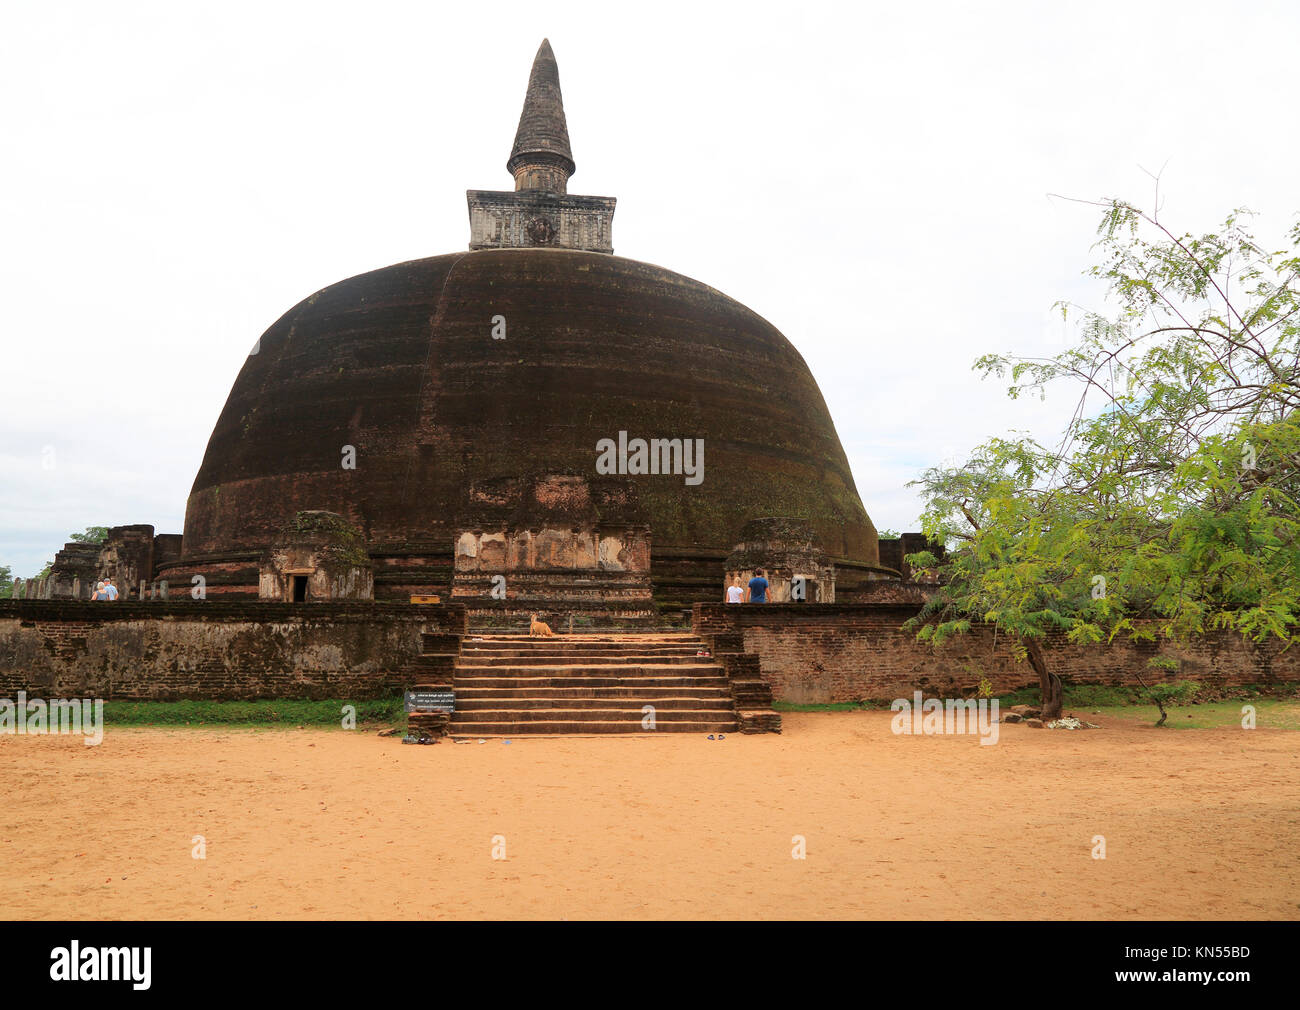 Rankot Vihara stupa UNESCO World Heritage Site, the ancient city of Polonnaruwa, Sri Lanka, Asia - Stock Image